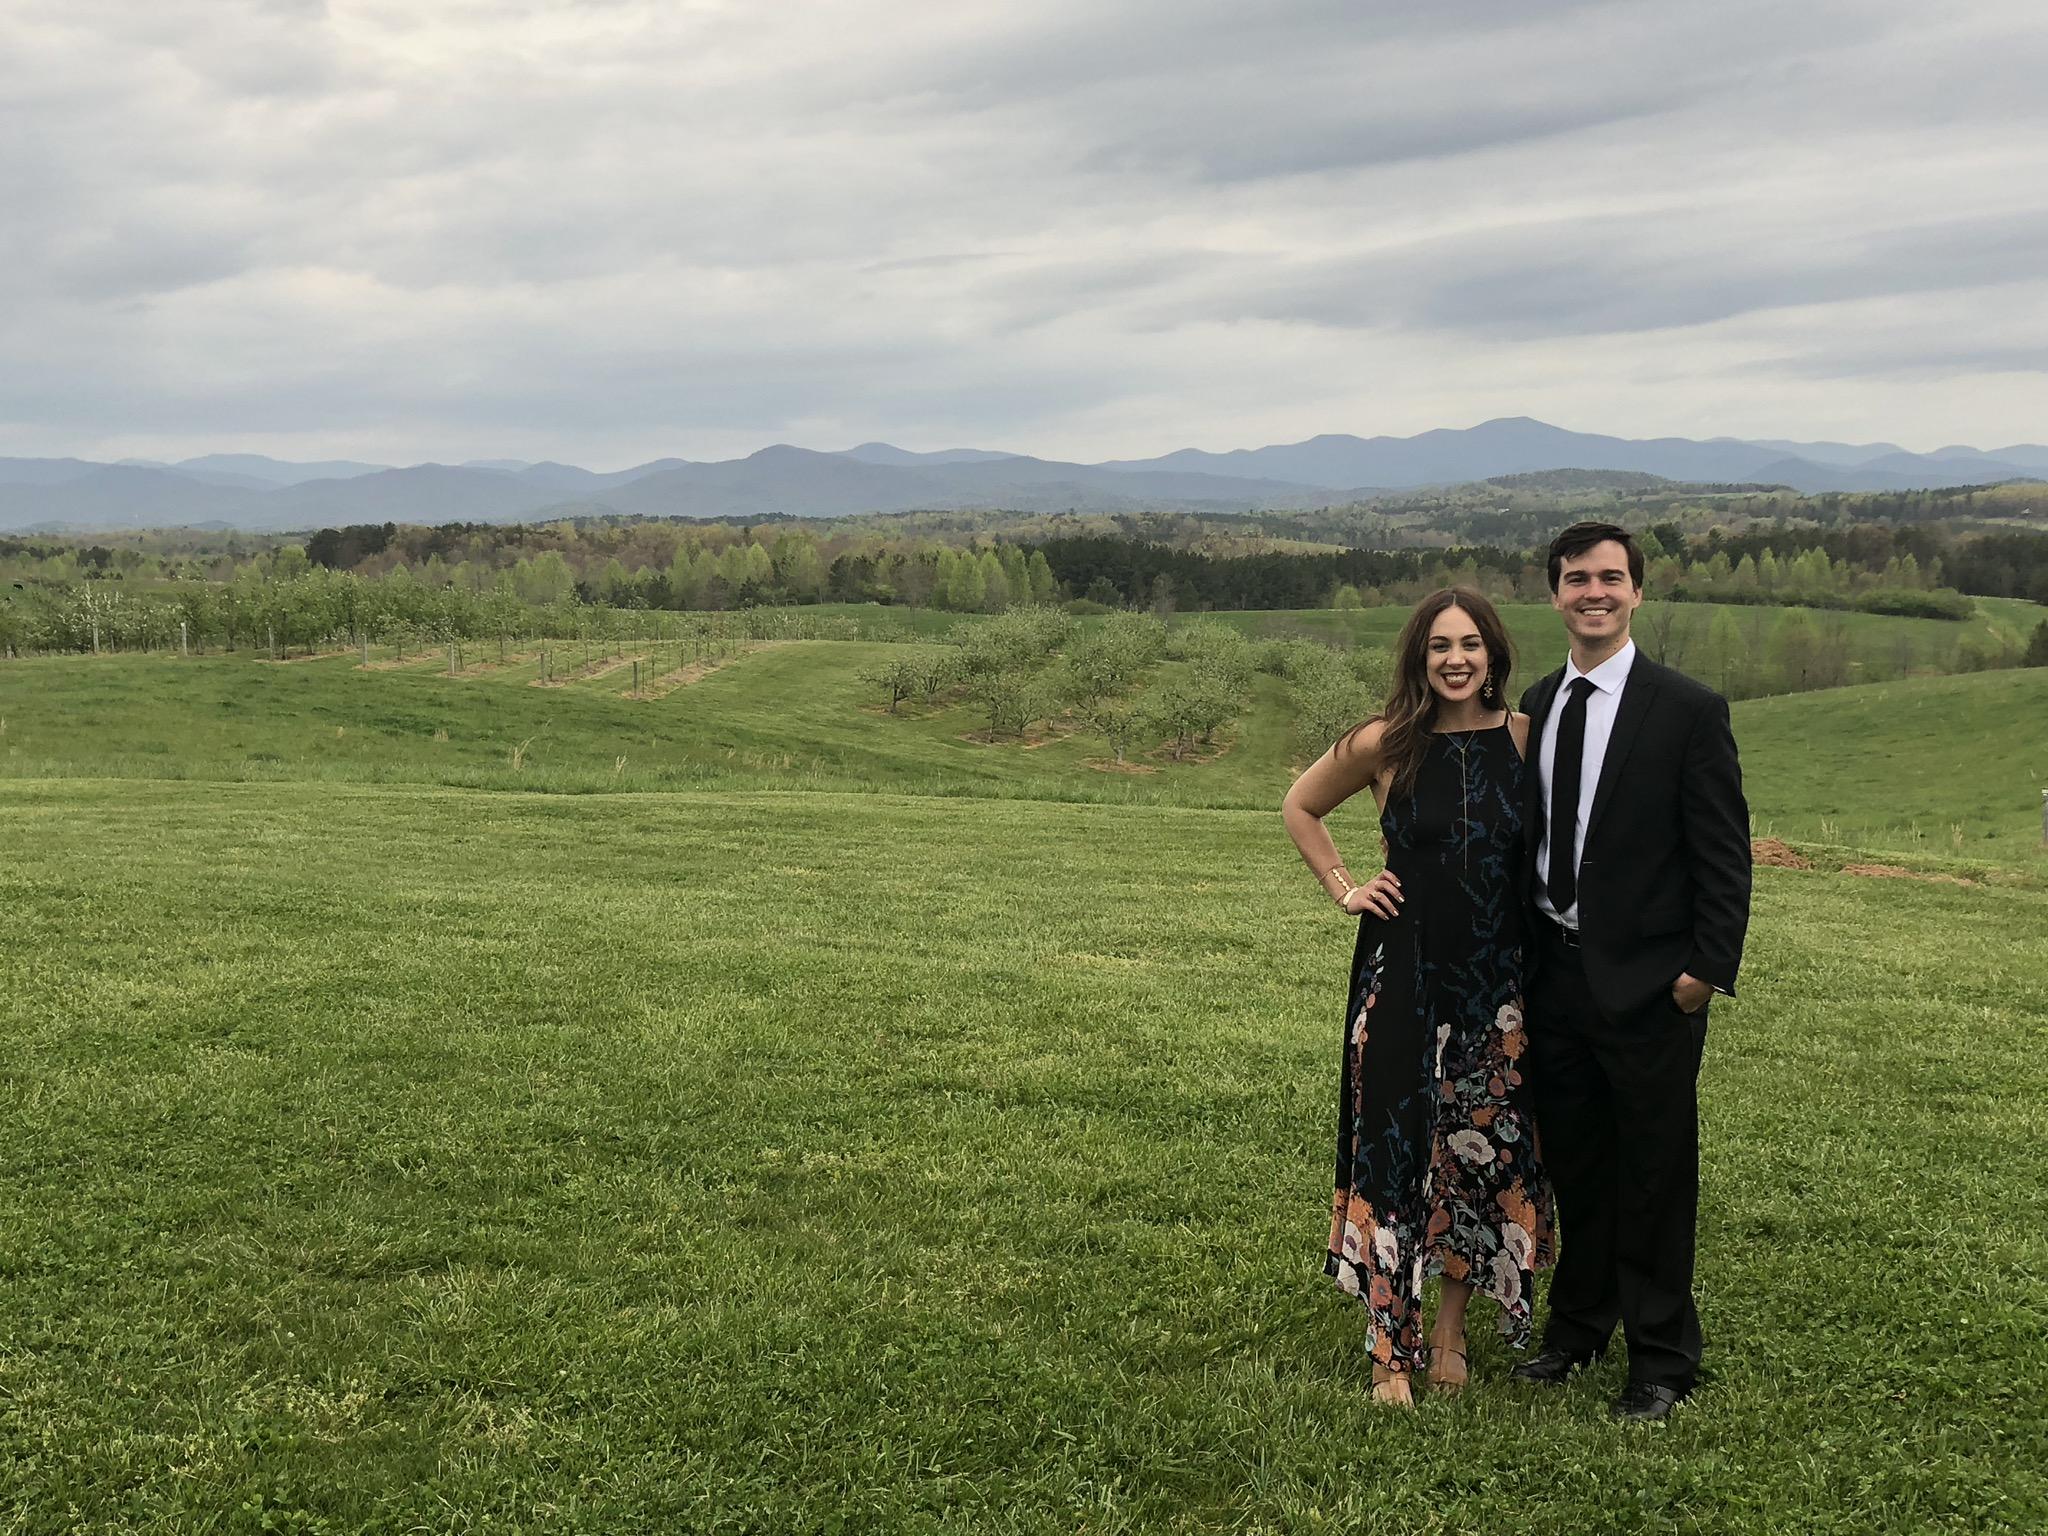 Us at Sara and Rob's wedding. Isn't it a beautiful view??